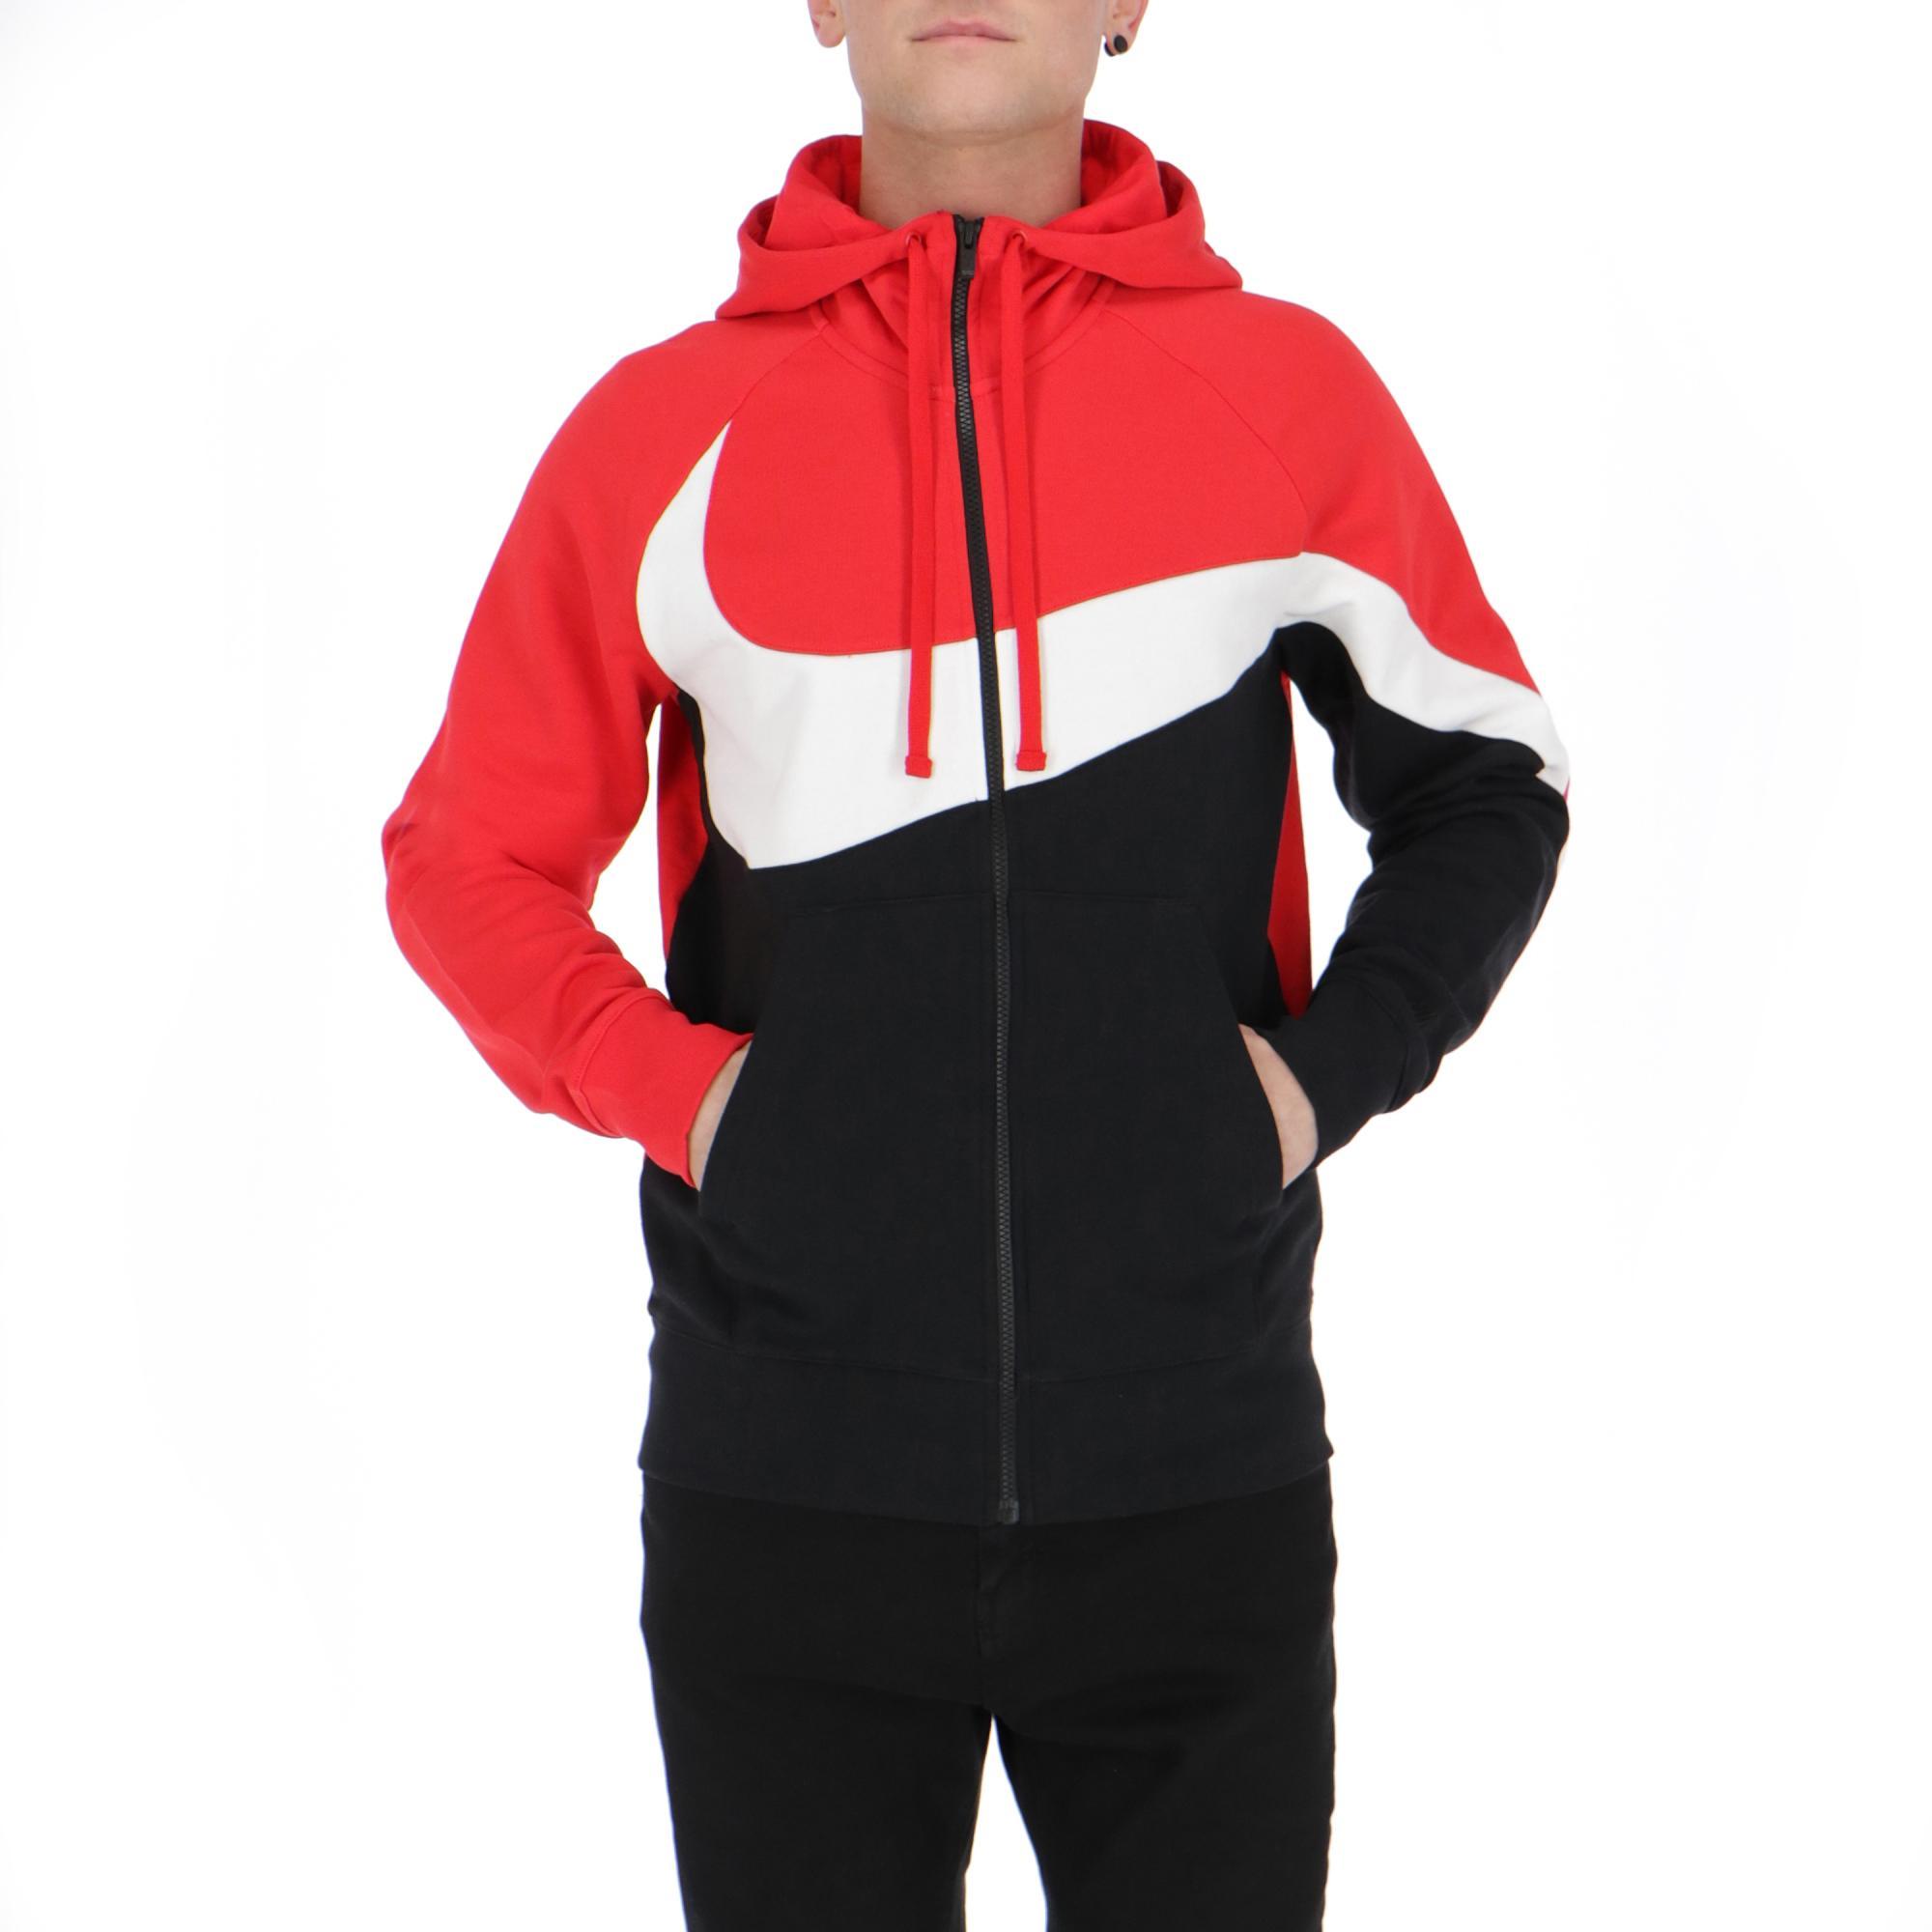 e91aea1db Nike Nsw Hbr Hoodie Fz Ft Stmt Unvred Black | Treesse